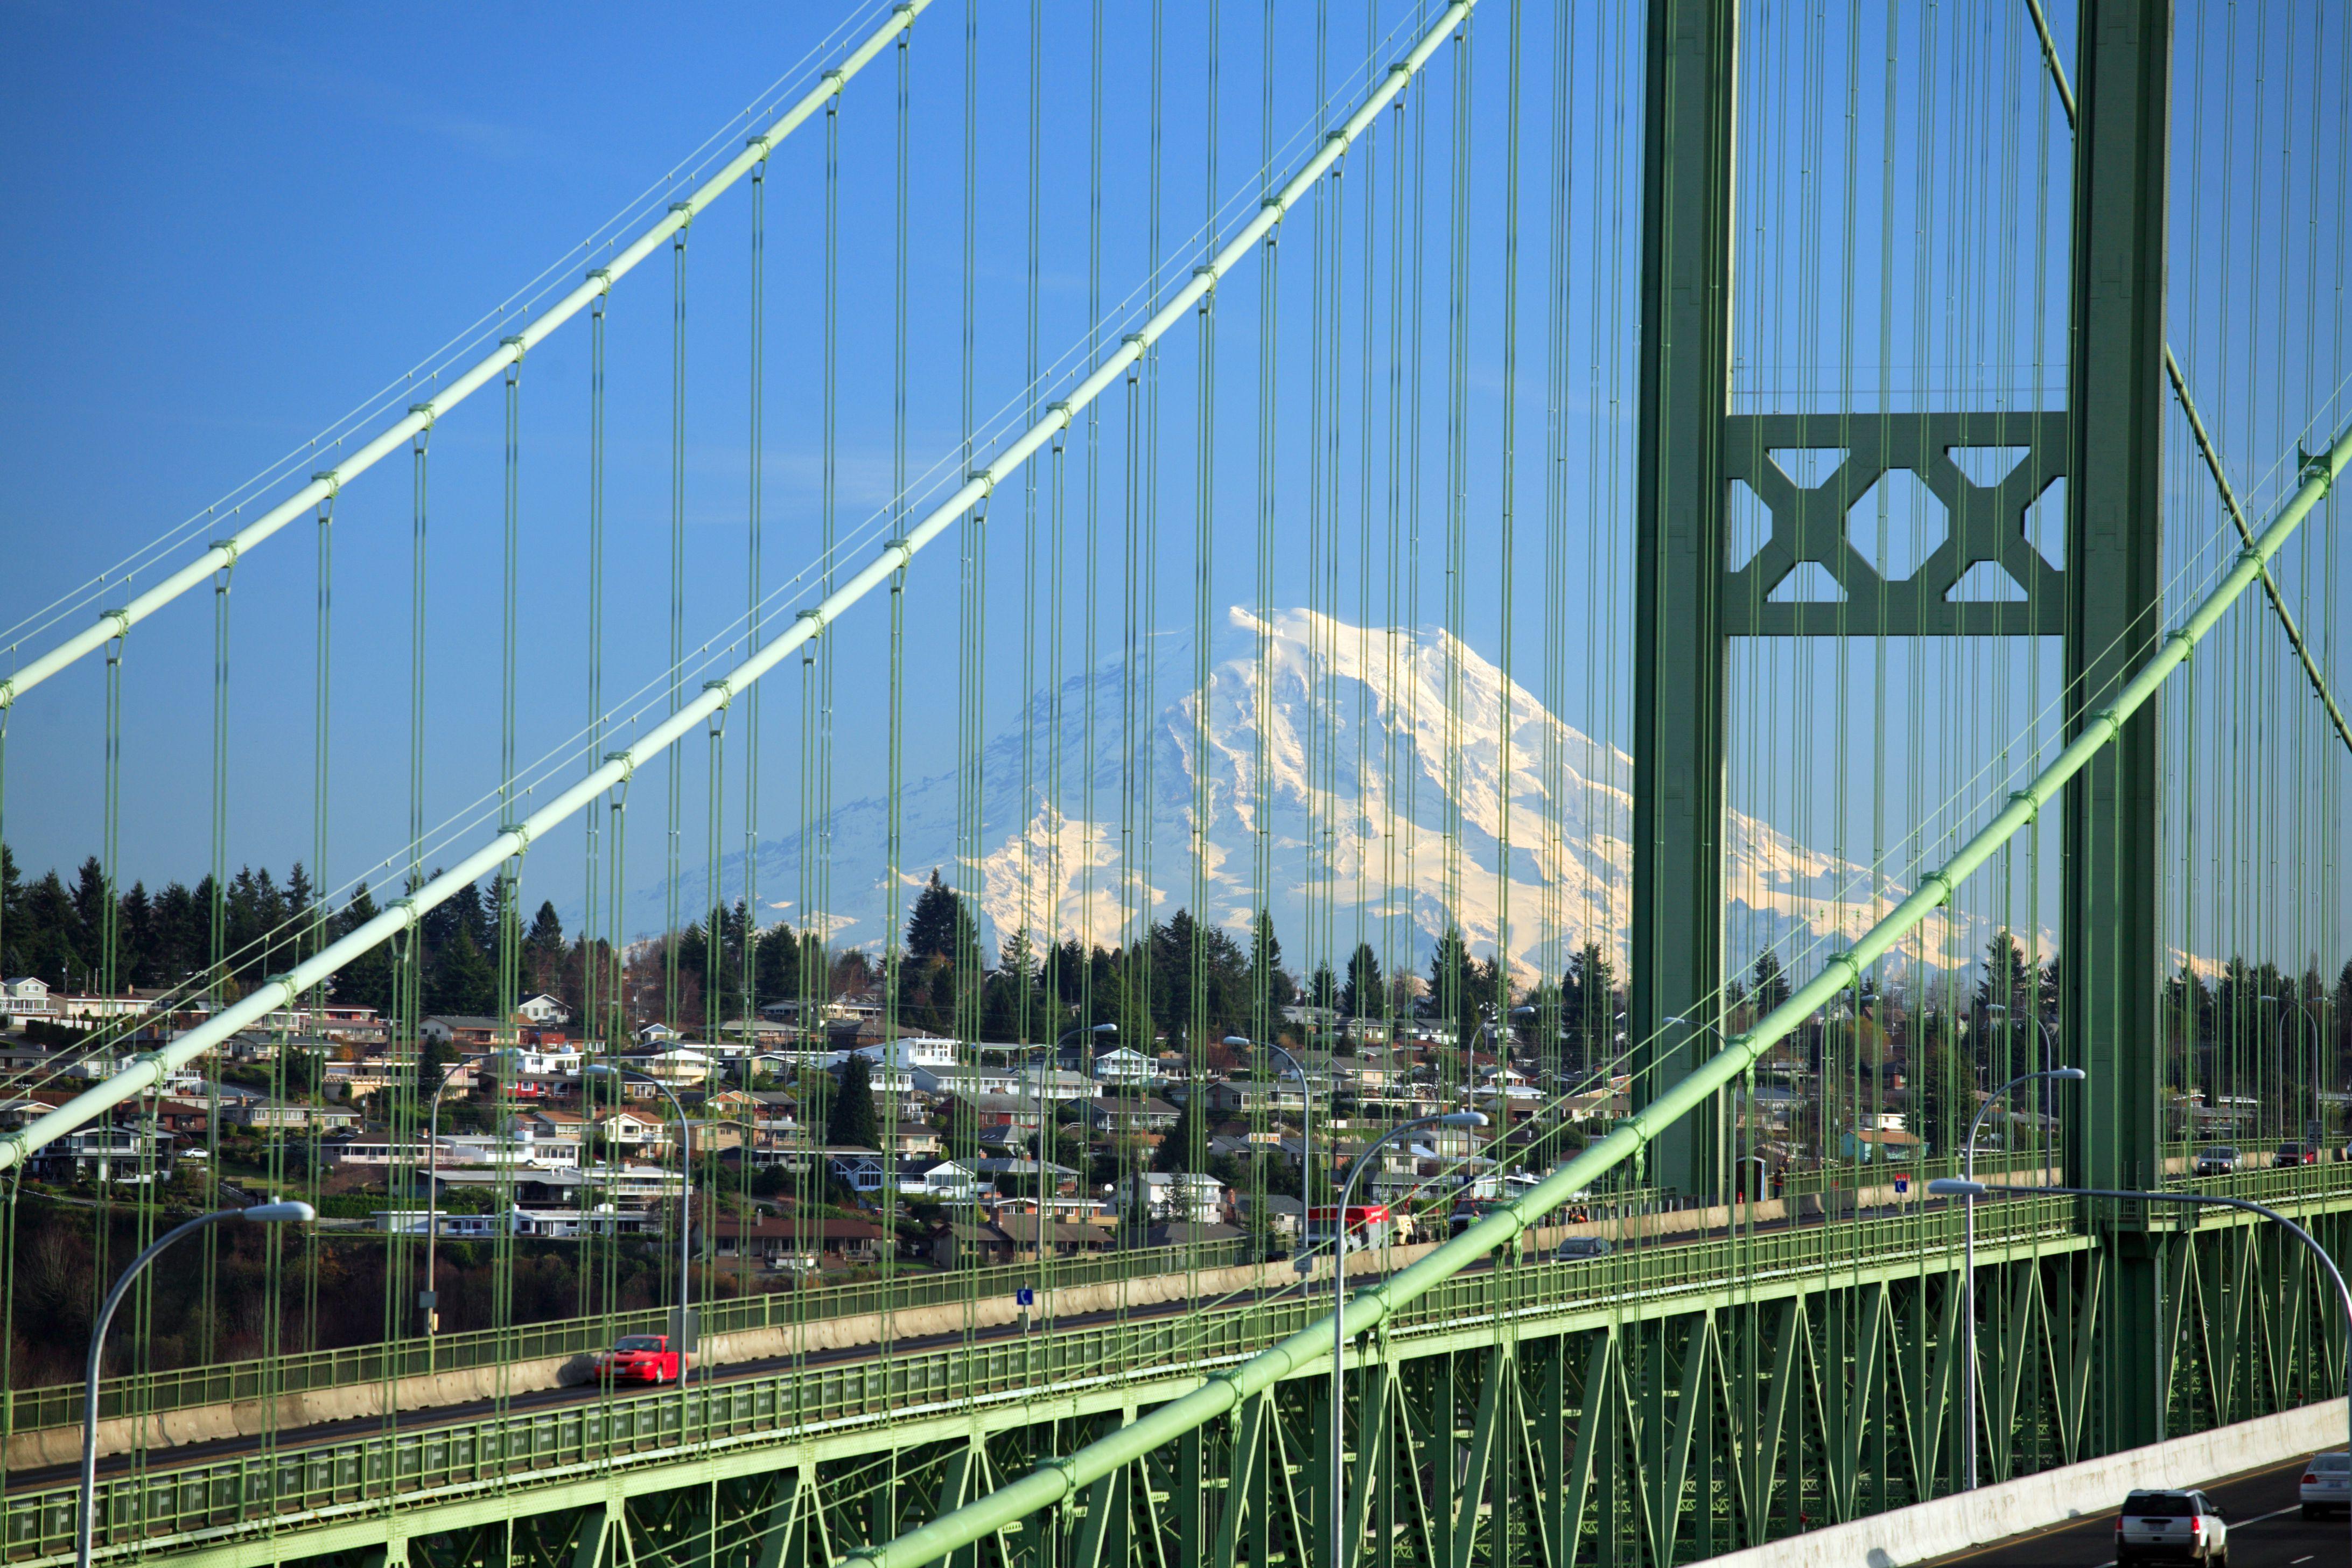 Tacoma Narrows Bridge, WA